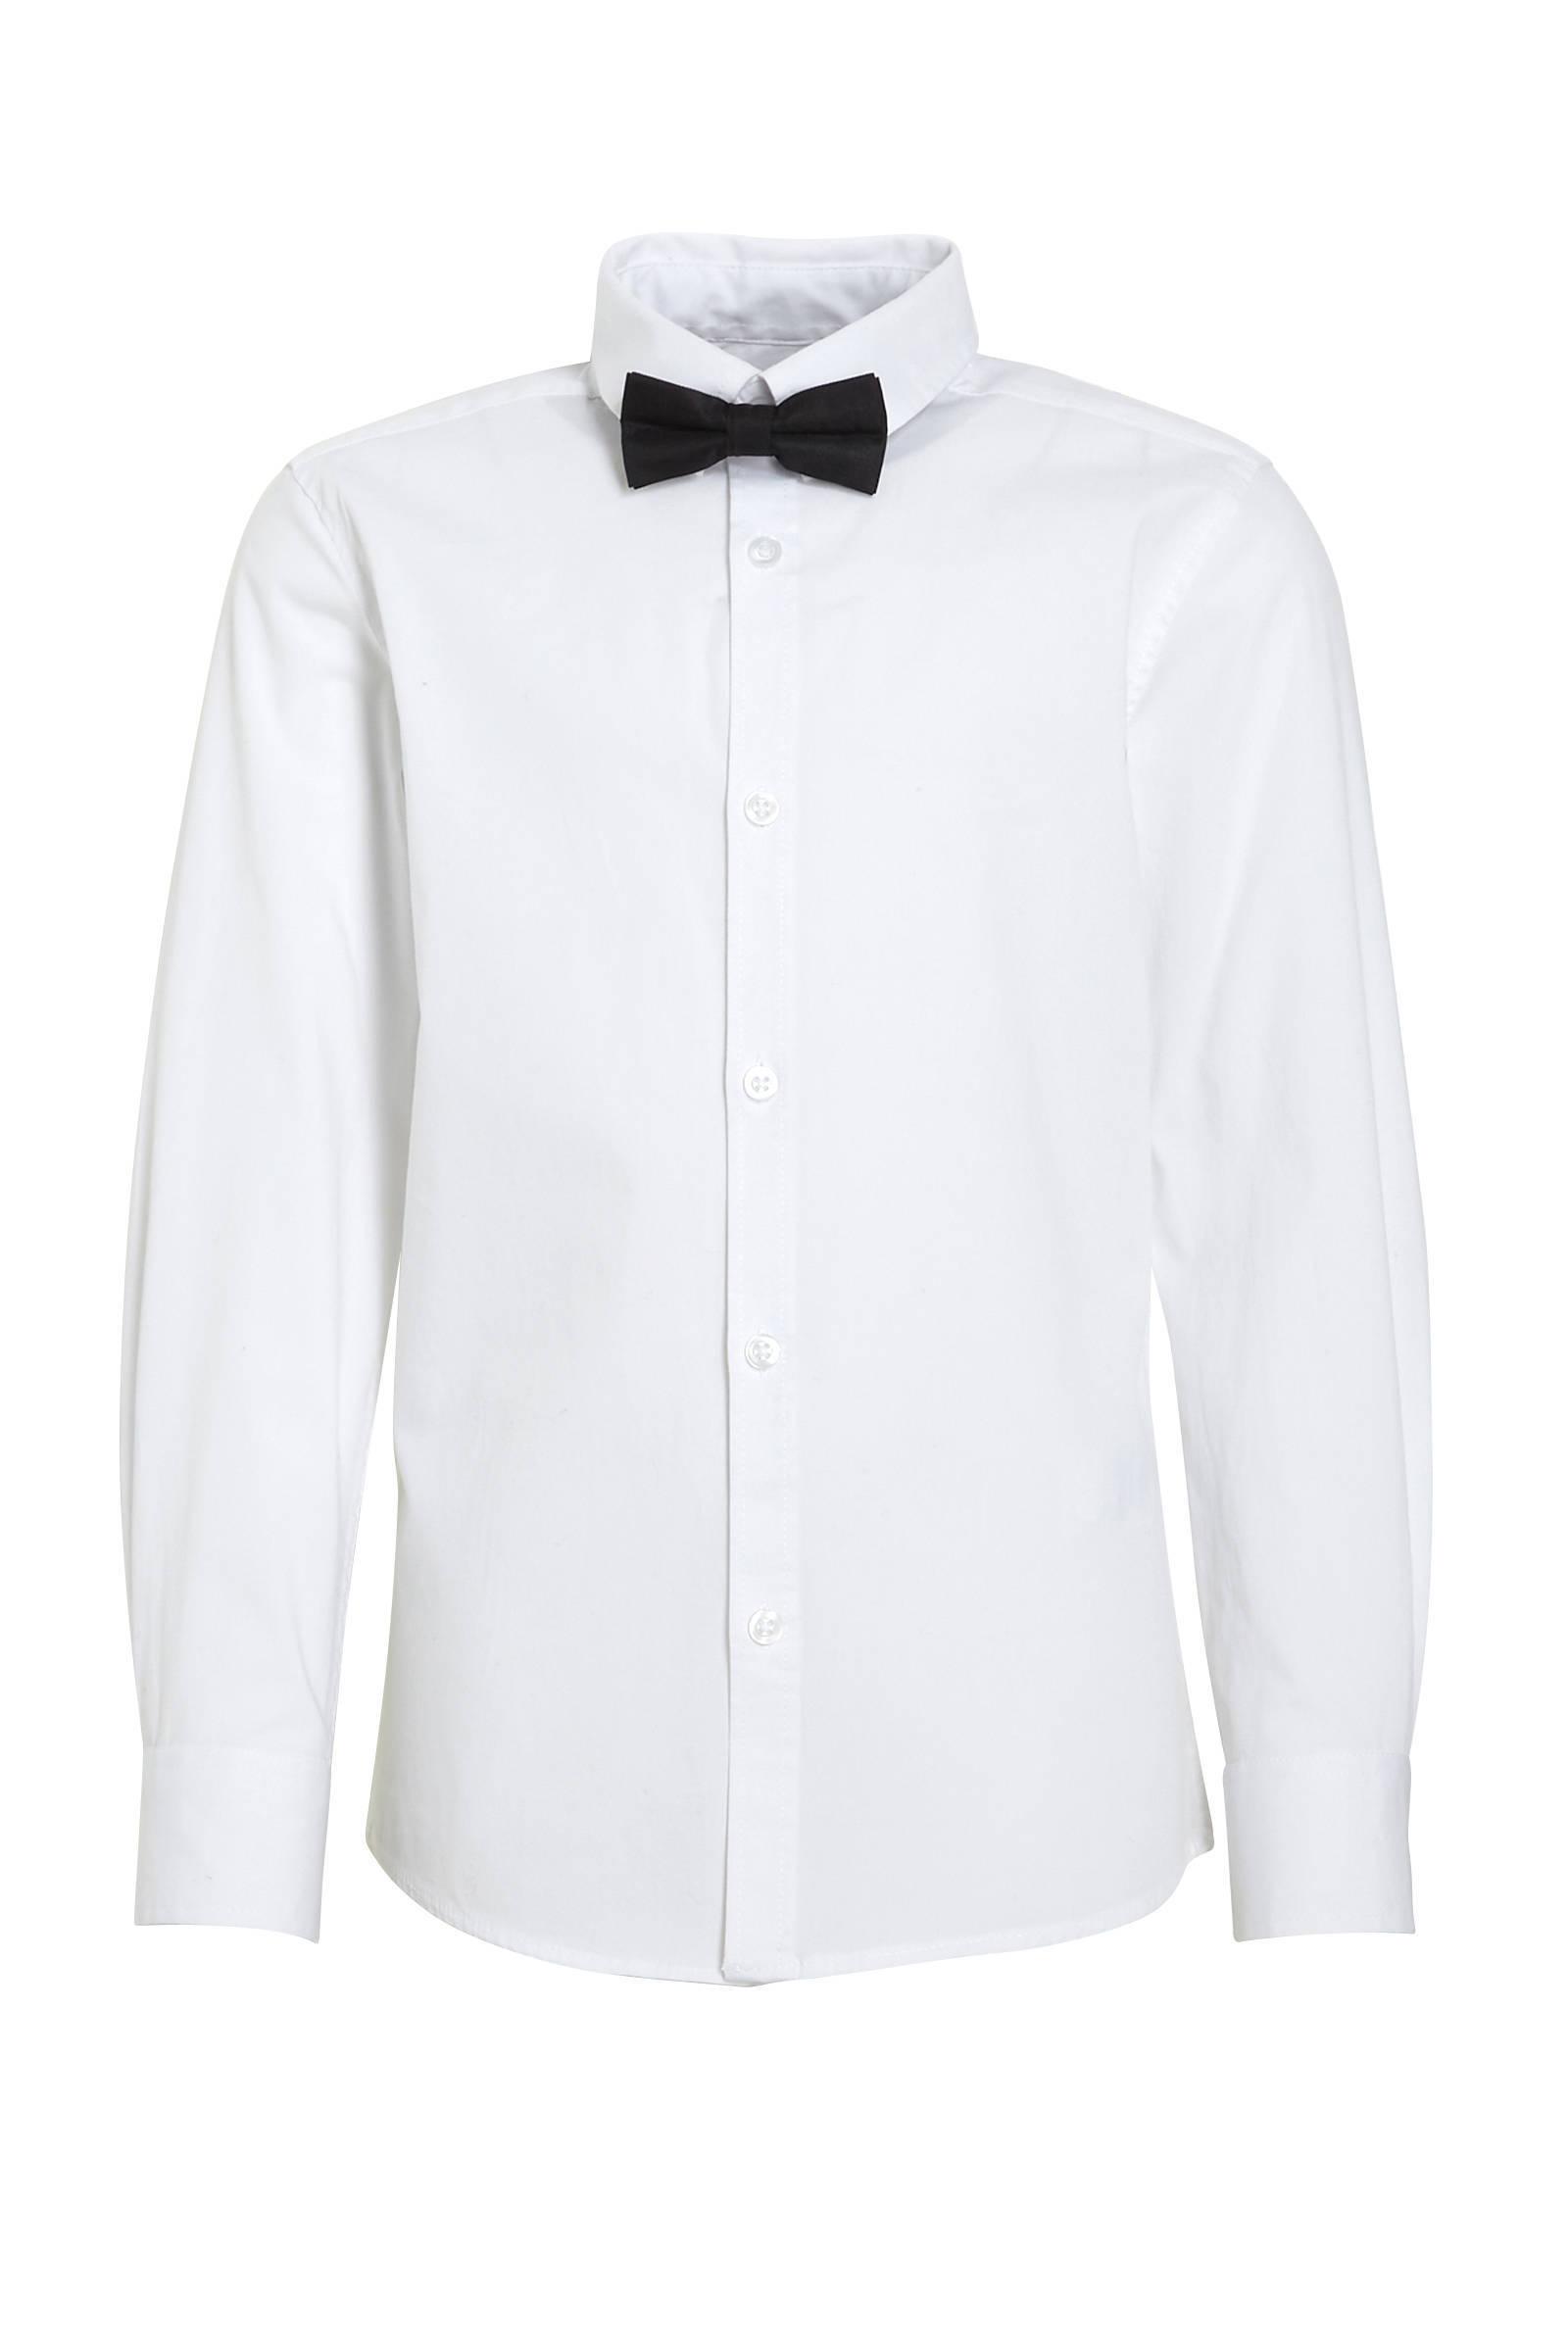 WE Fashion overhemd + vlinderstrik wit (jongens)